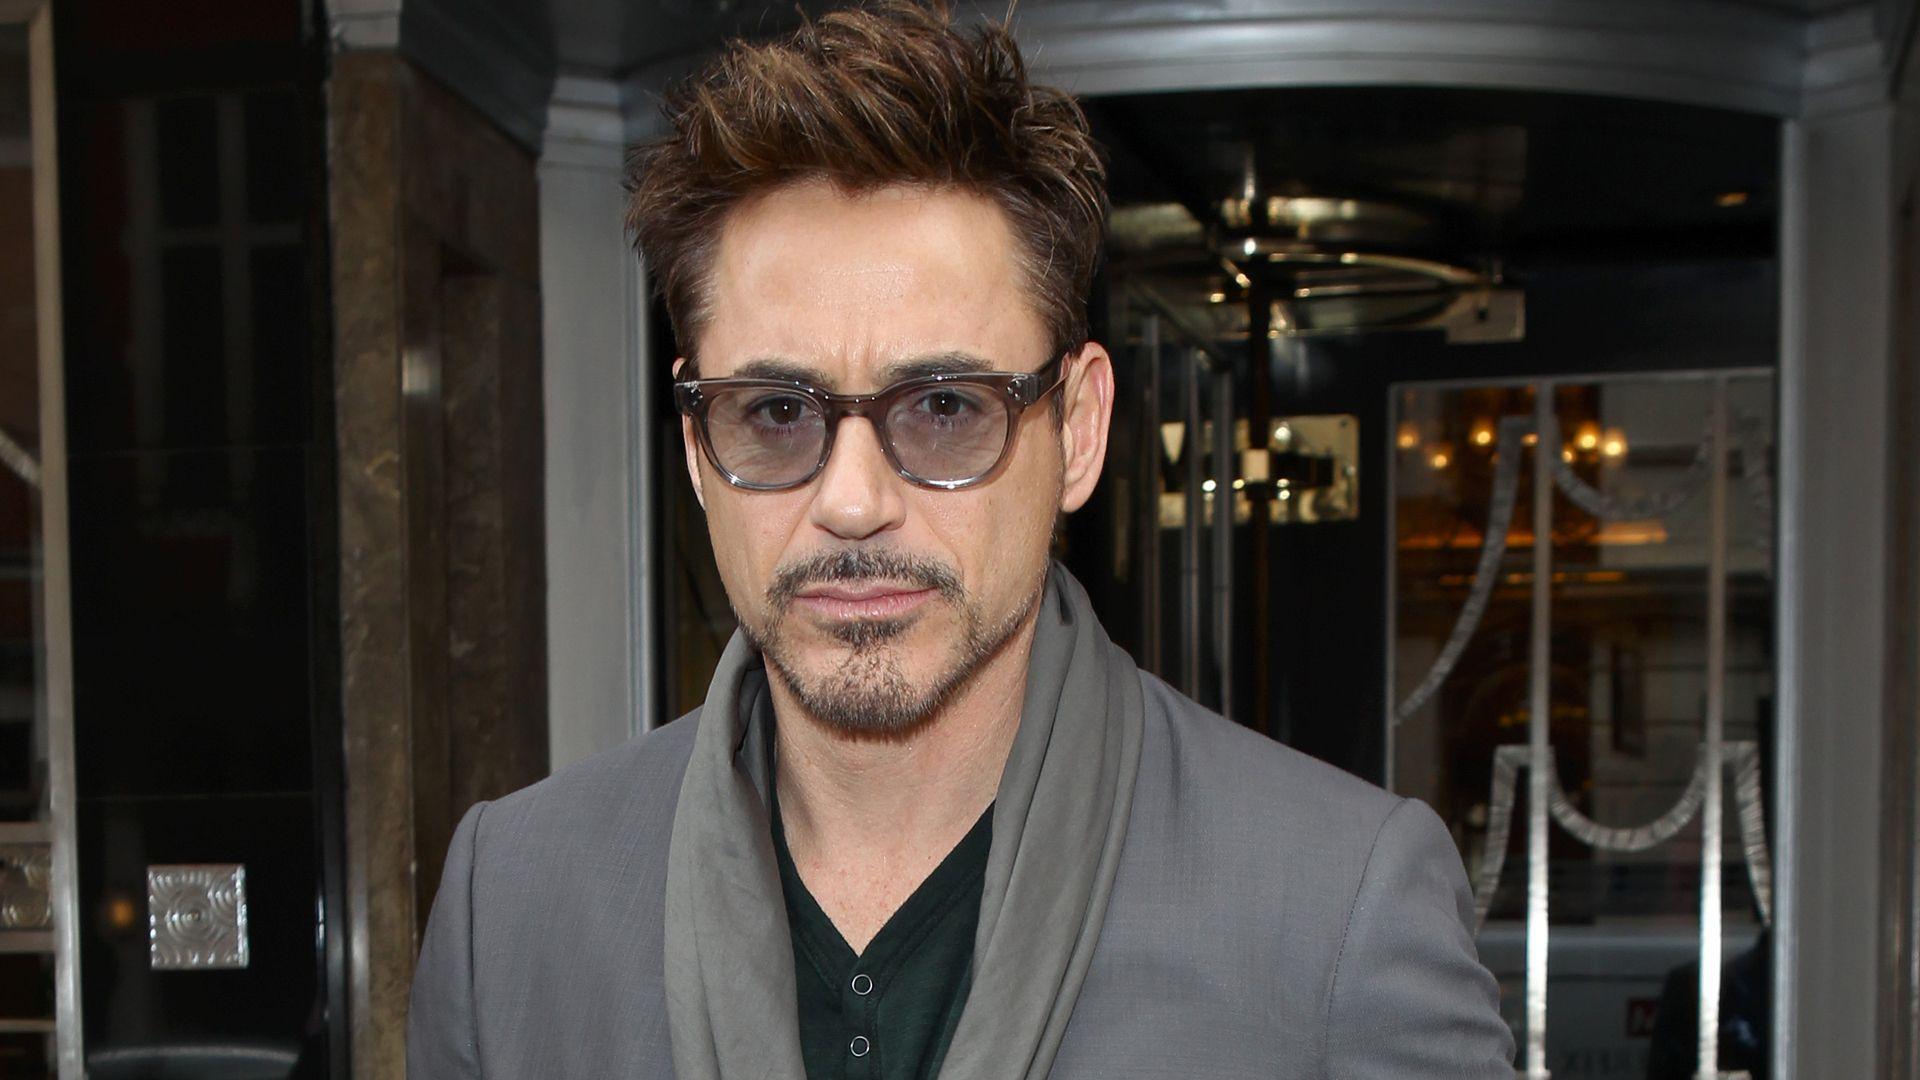 Robert Downey Jr Hd Wallpapers 10 Beautiful Wallpaper Downey